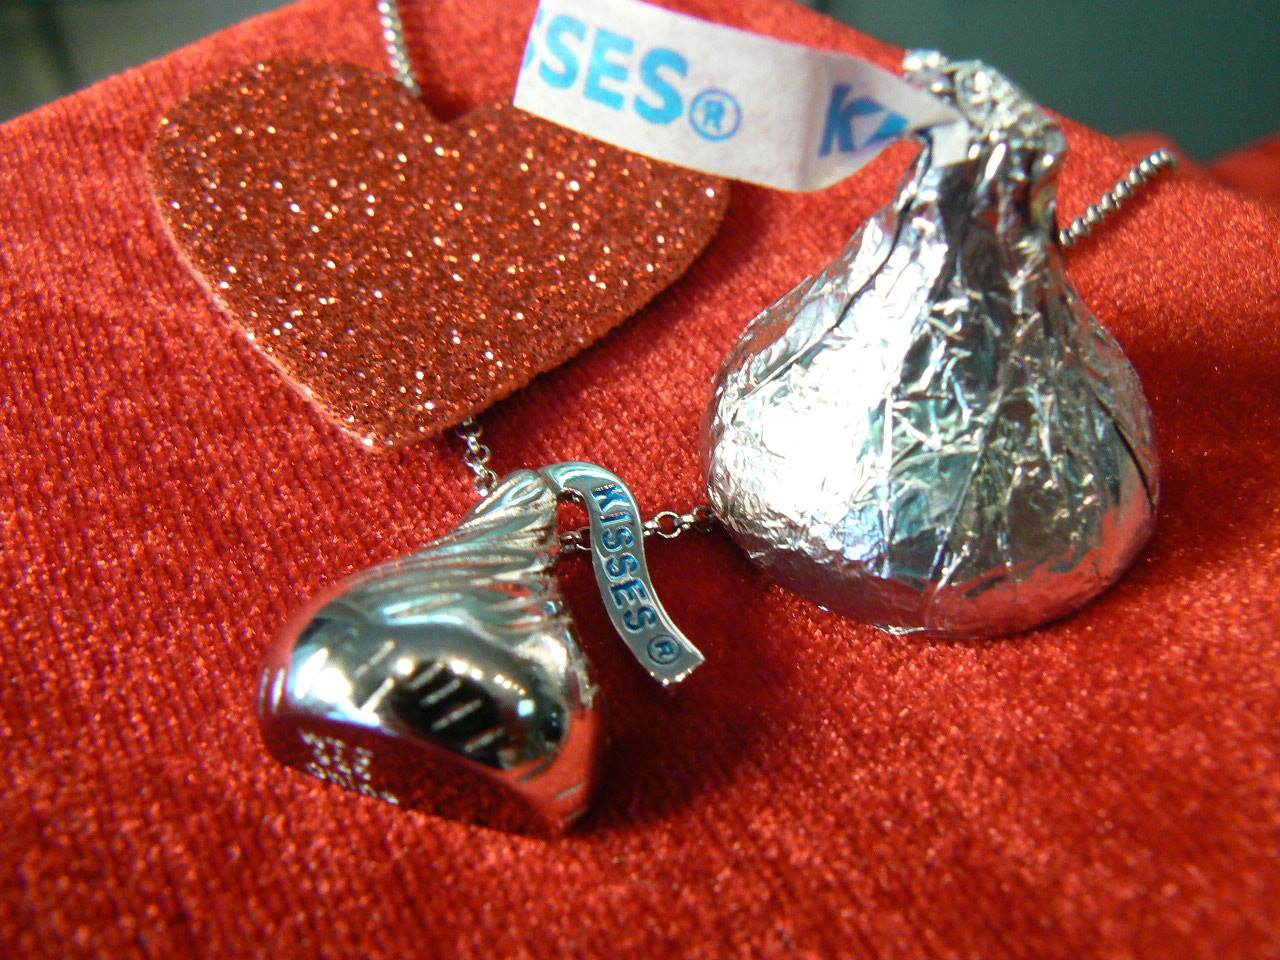 Sermania Jewelery East Passyunk Valentine's Day